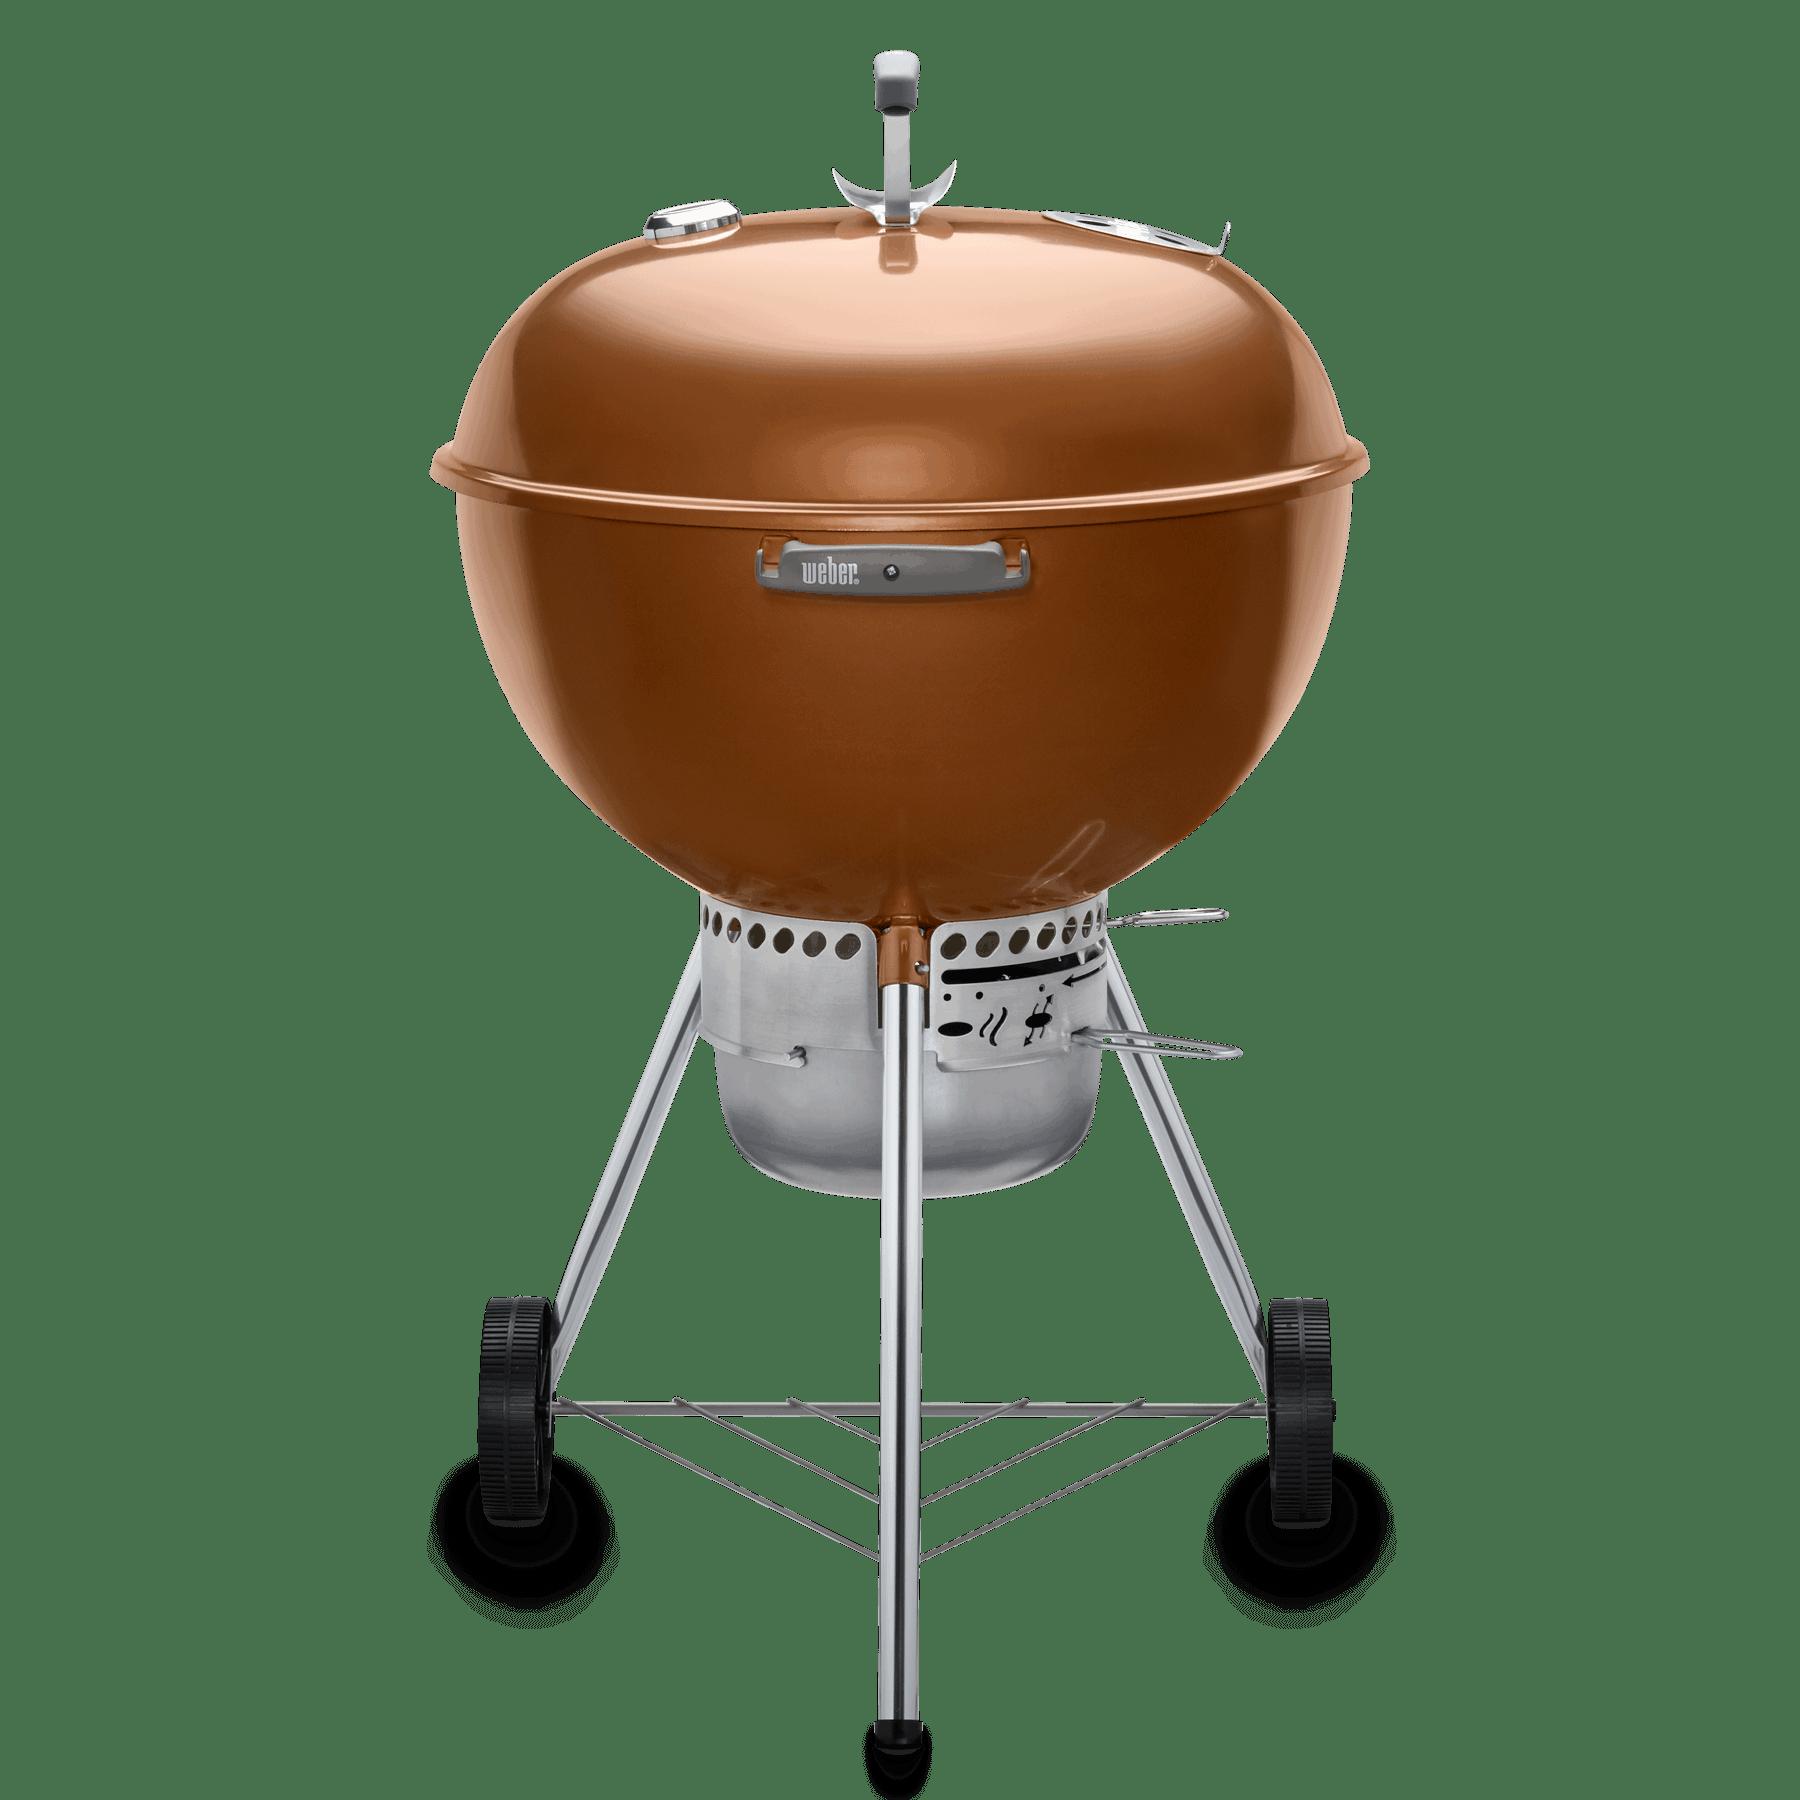 Weber 57cm Premium Kettle Charcoal Braai